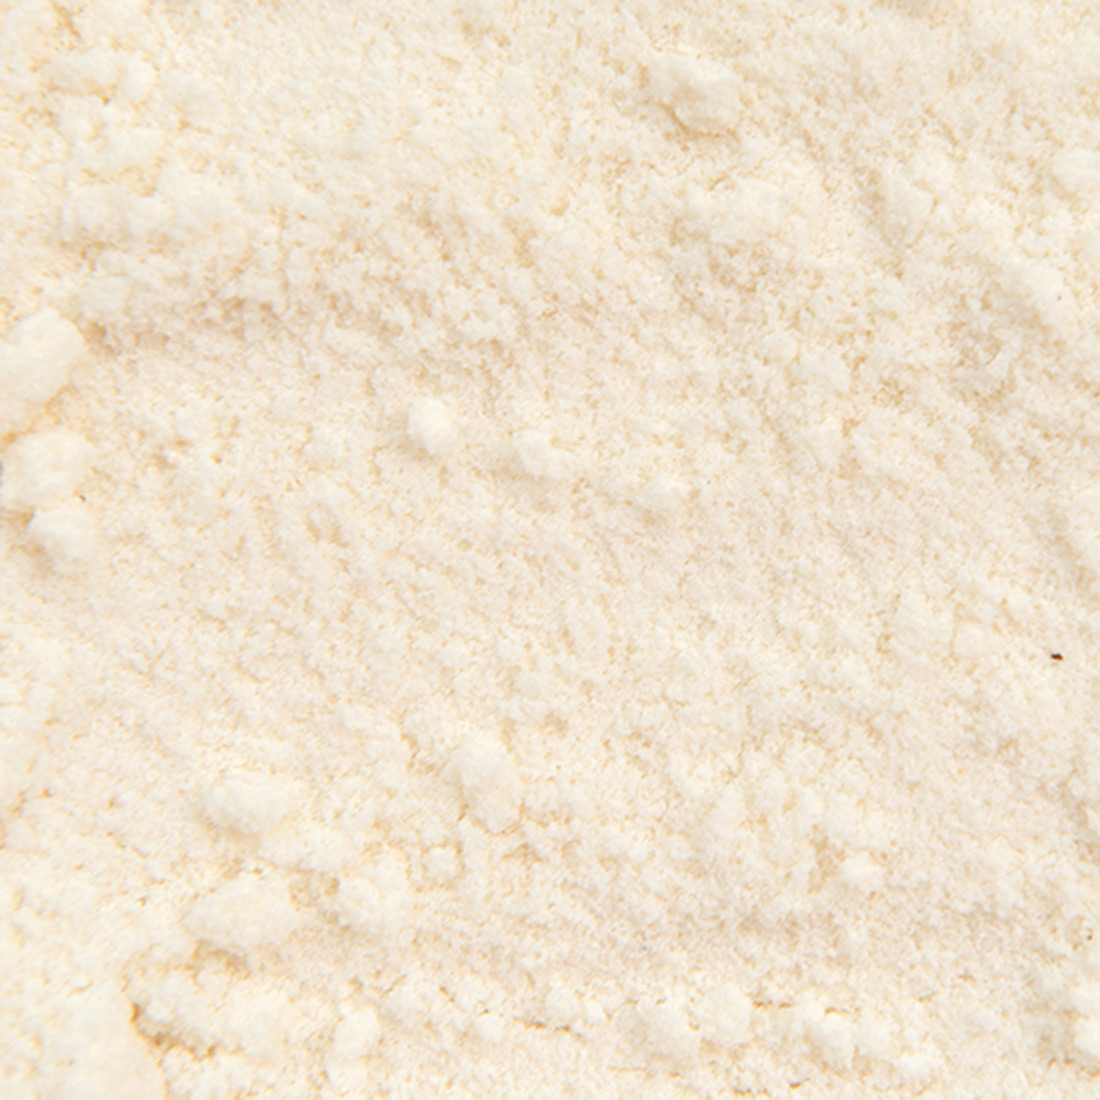 Kokosmeel bio